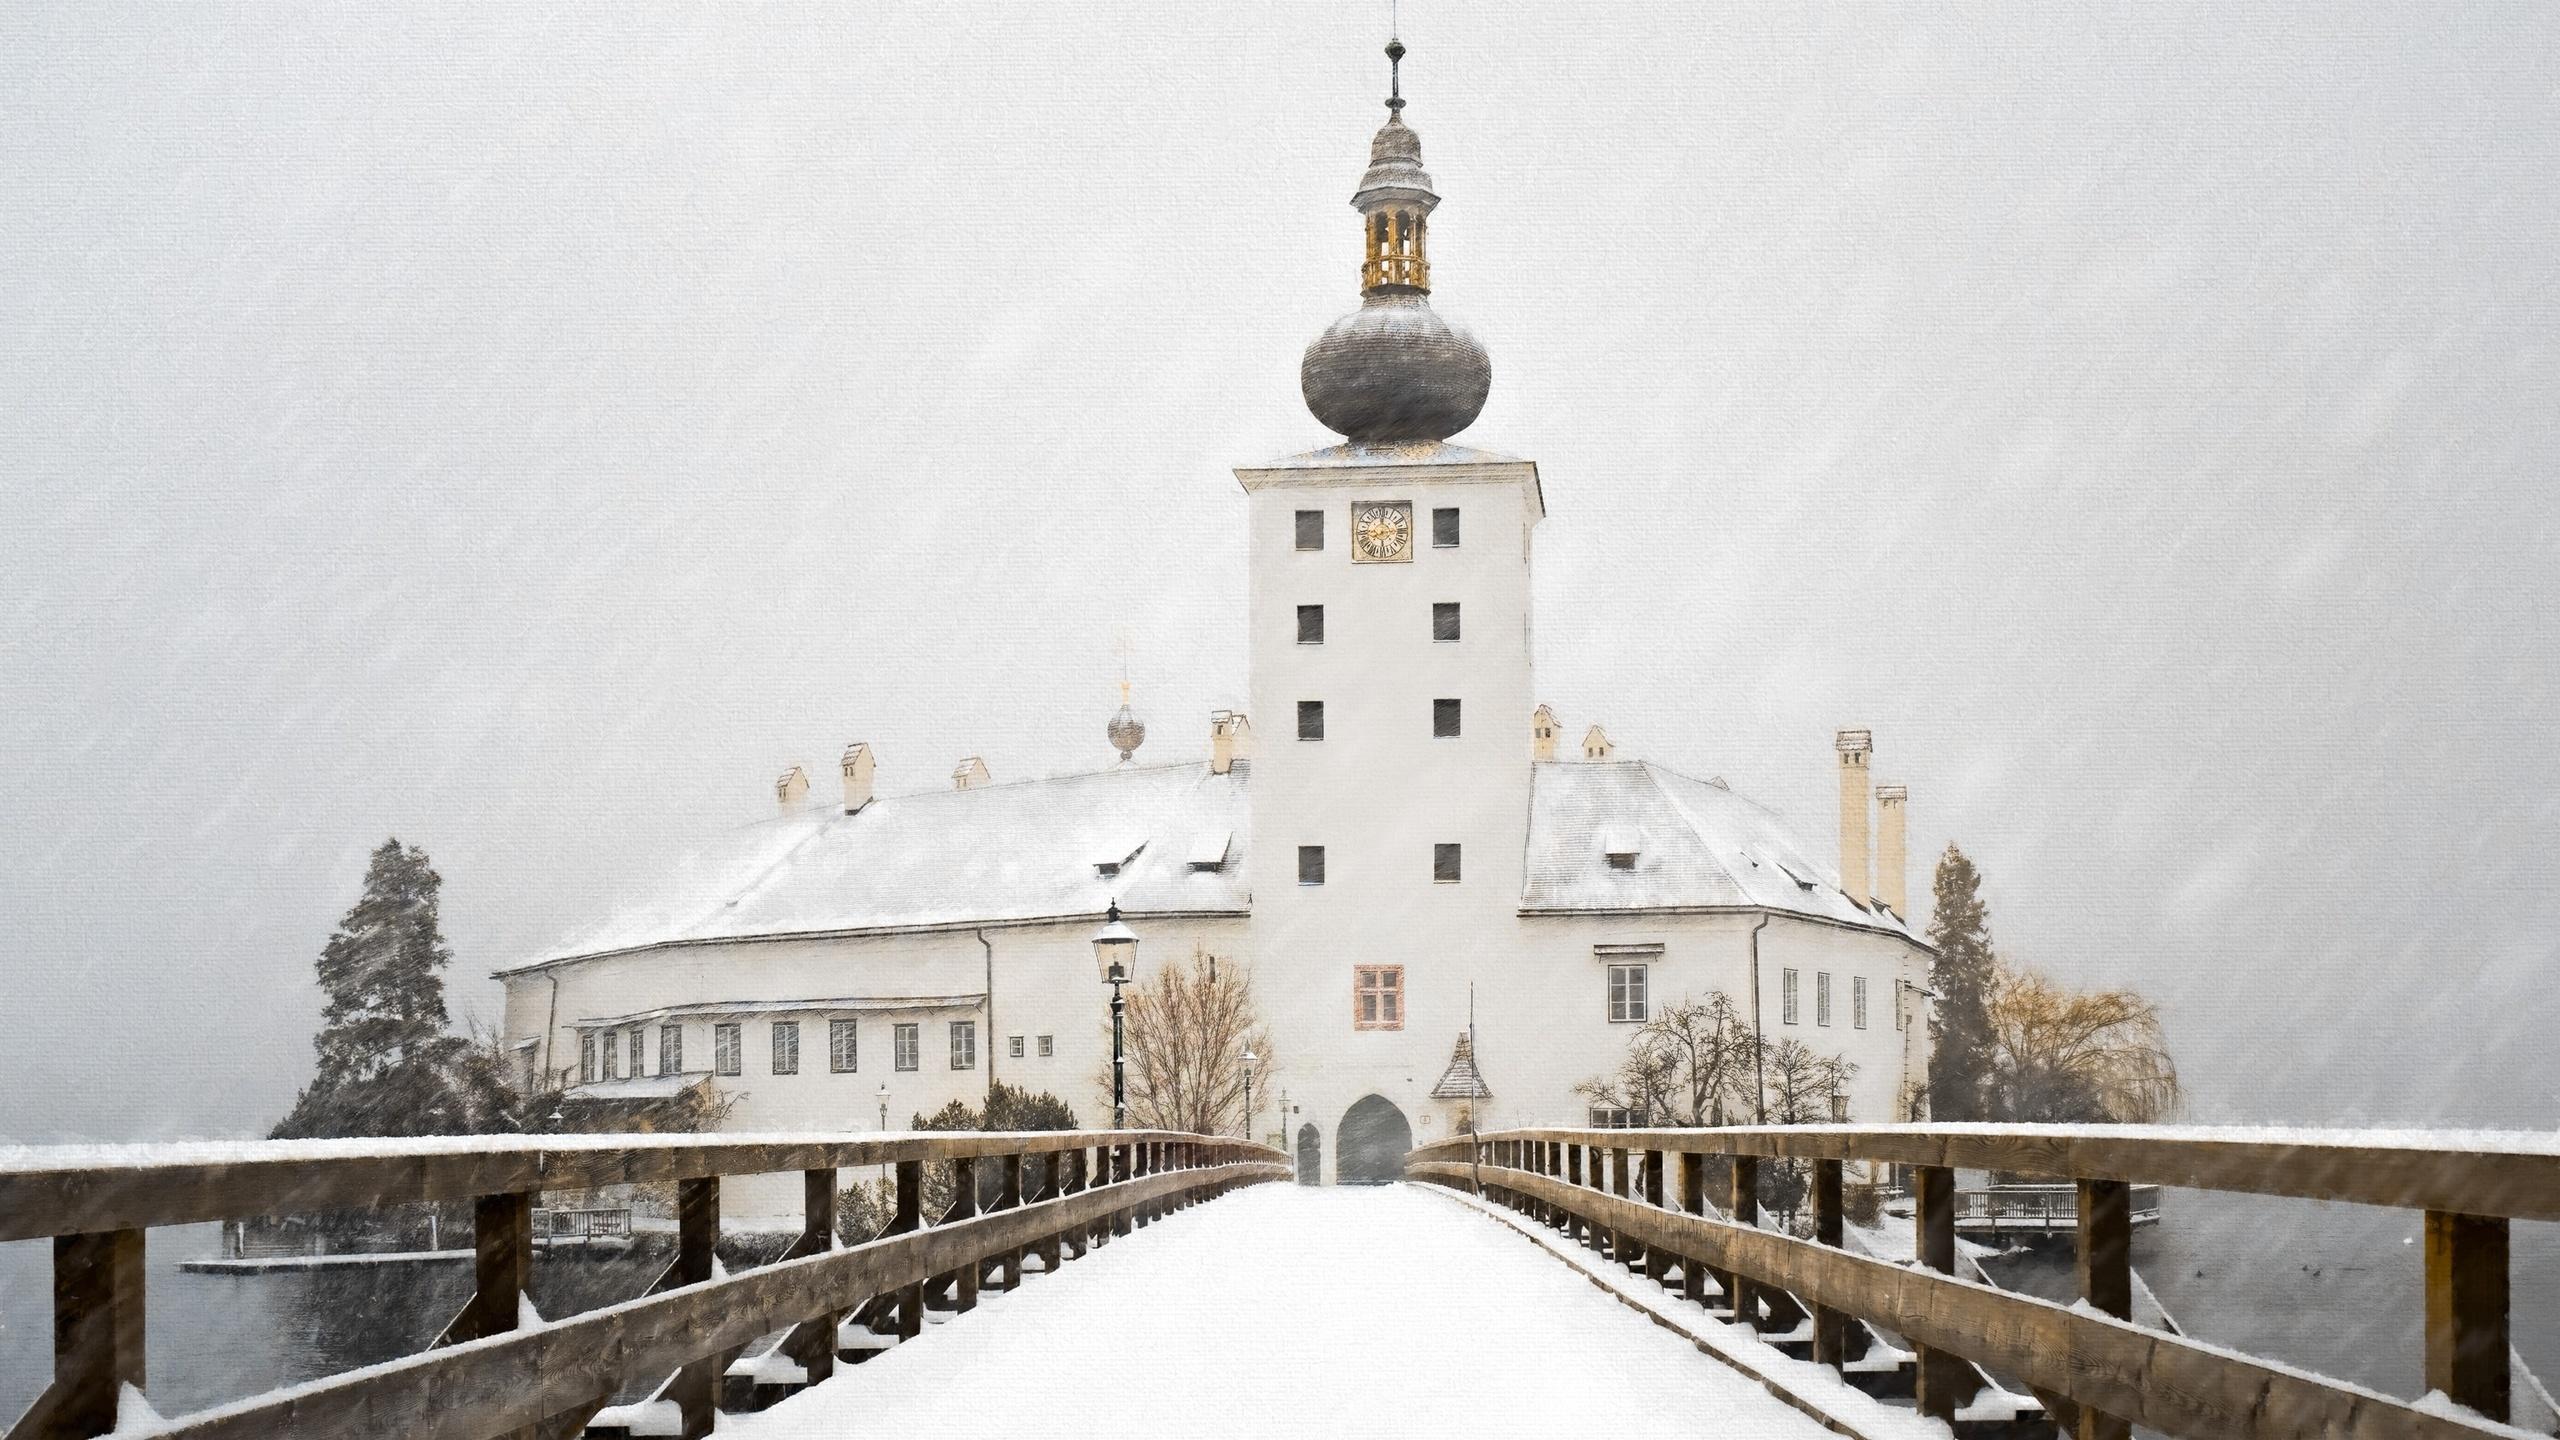 мост, снег, церковь